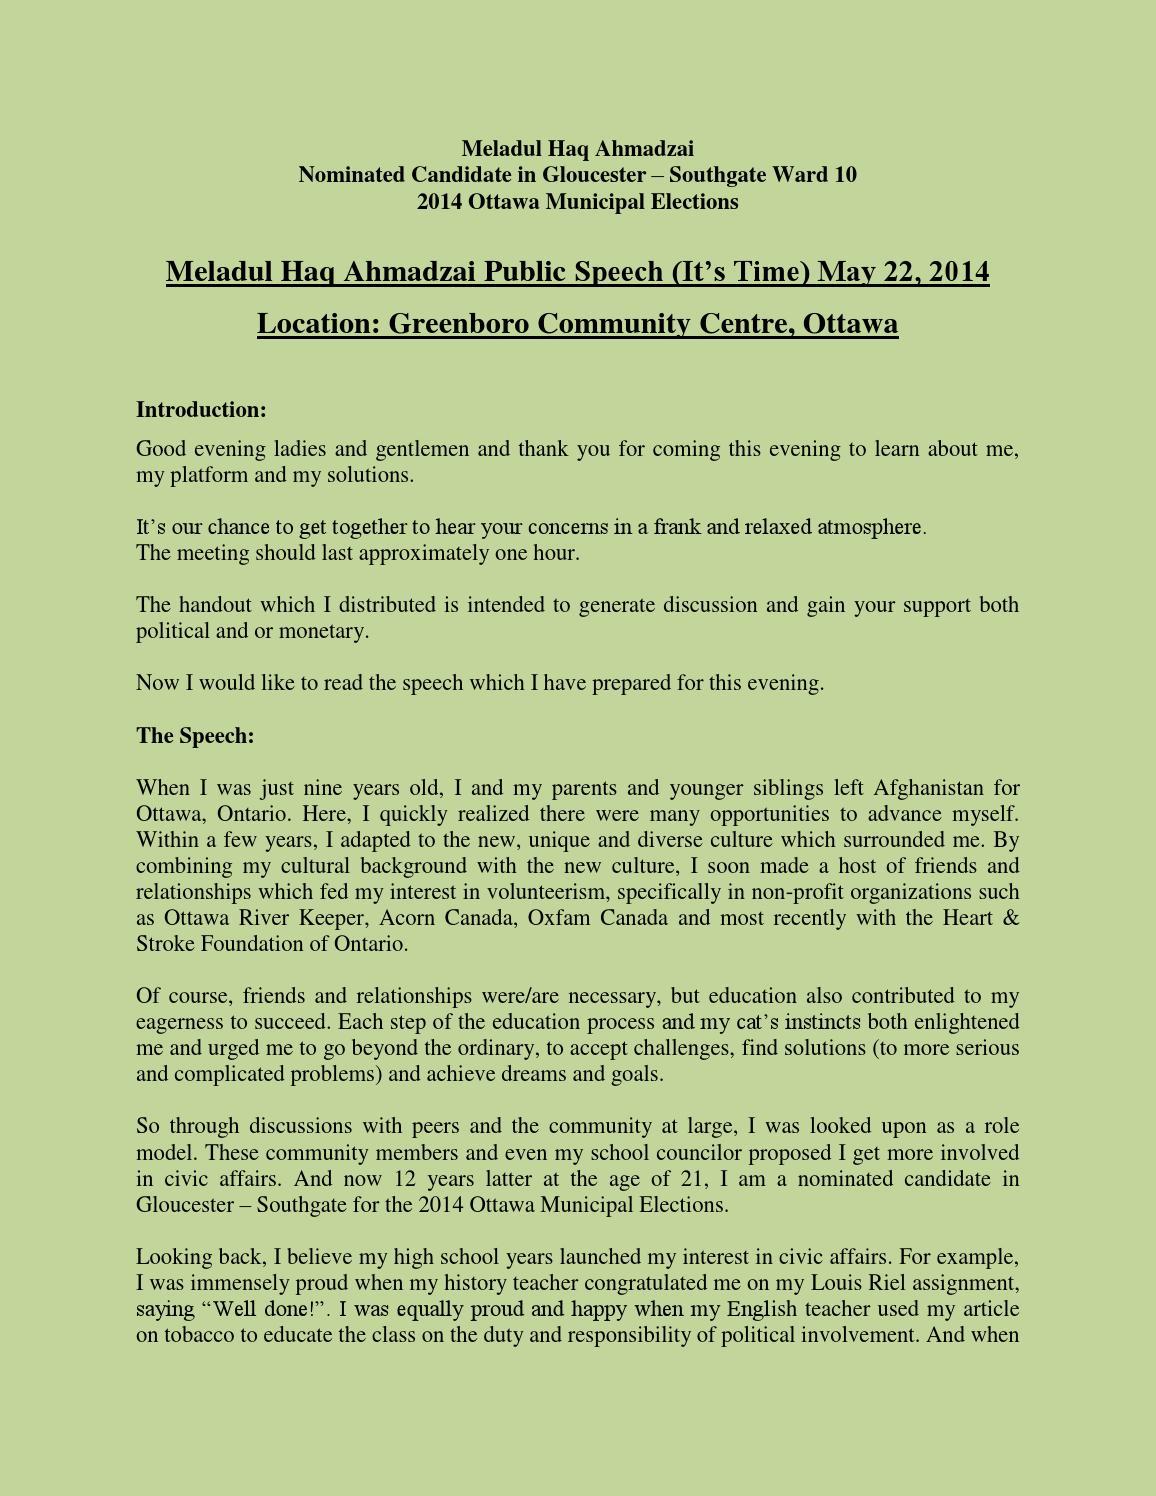 Meladul Haq Ahmadzai - Public Speech (It's Time) May 22